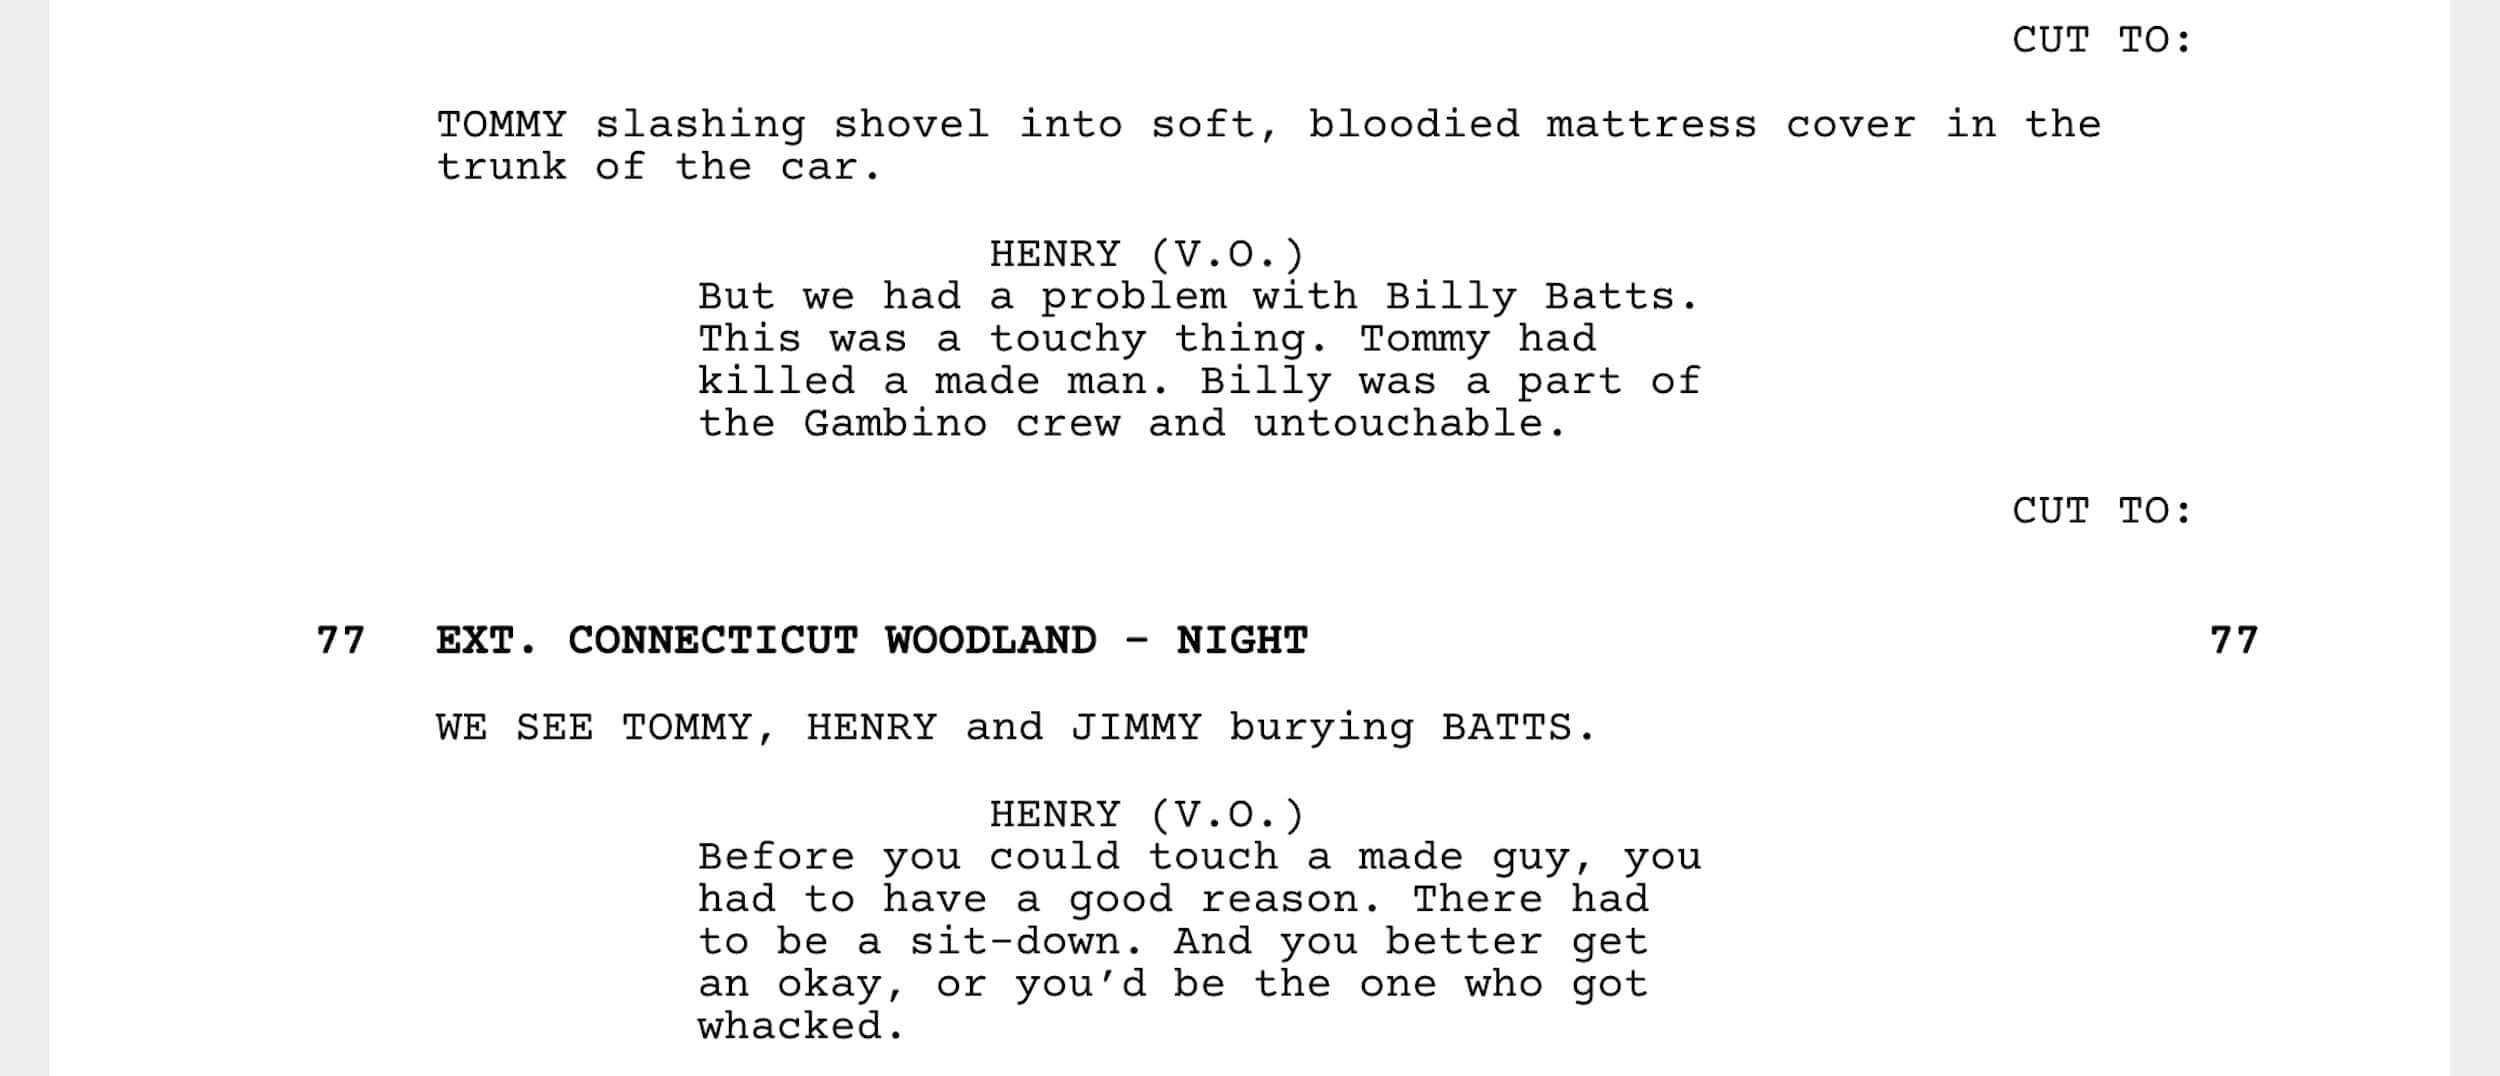 Goodfellas Script Teardown - Goodfellas Made Man - StudioBinder - Screenwriting